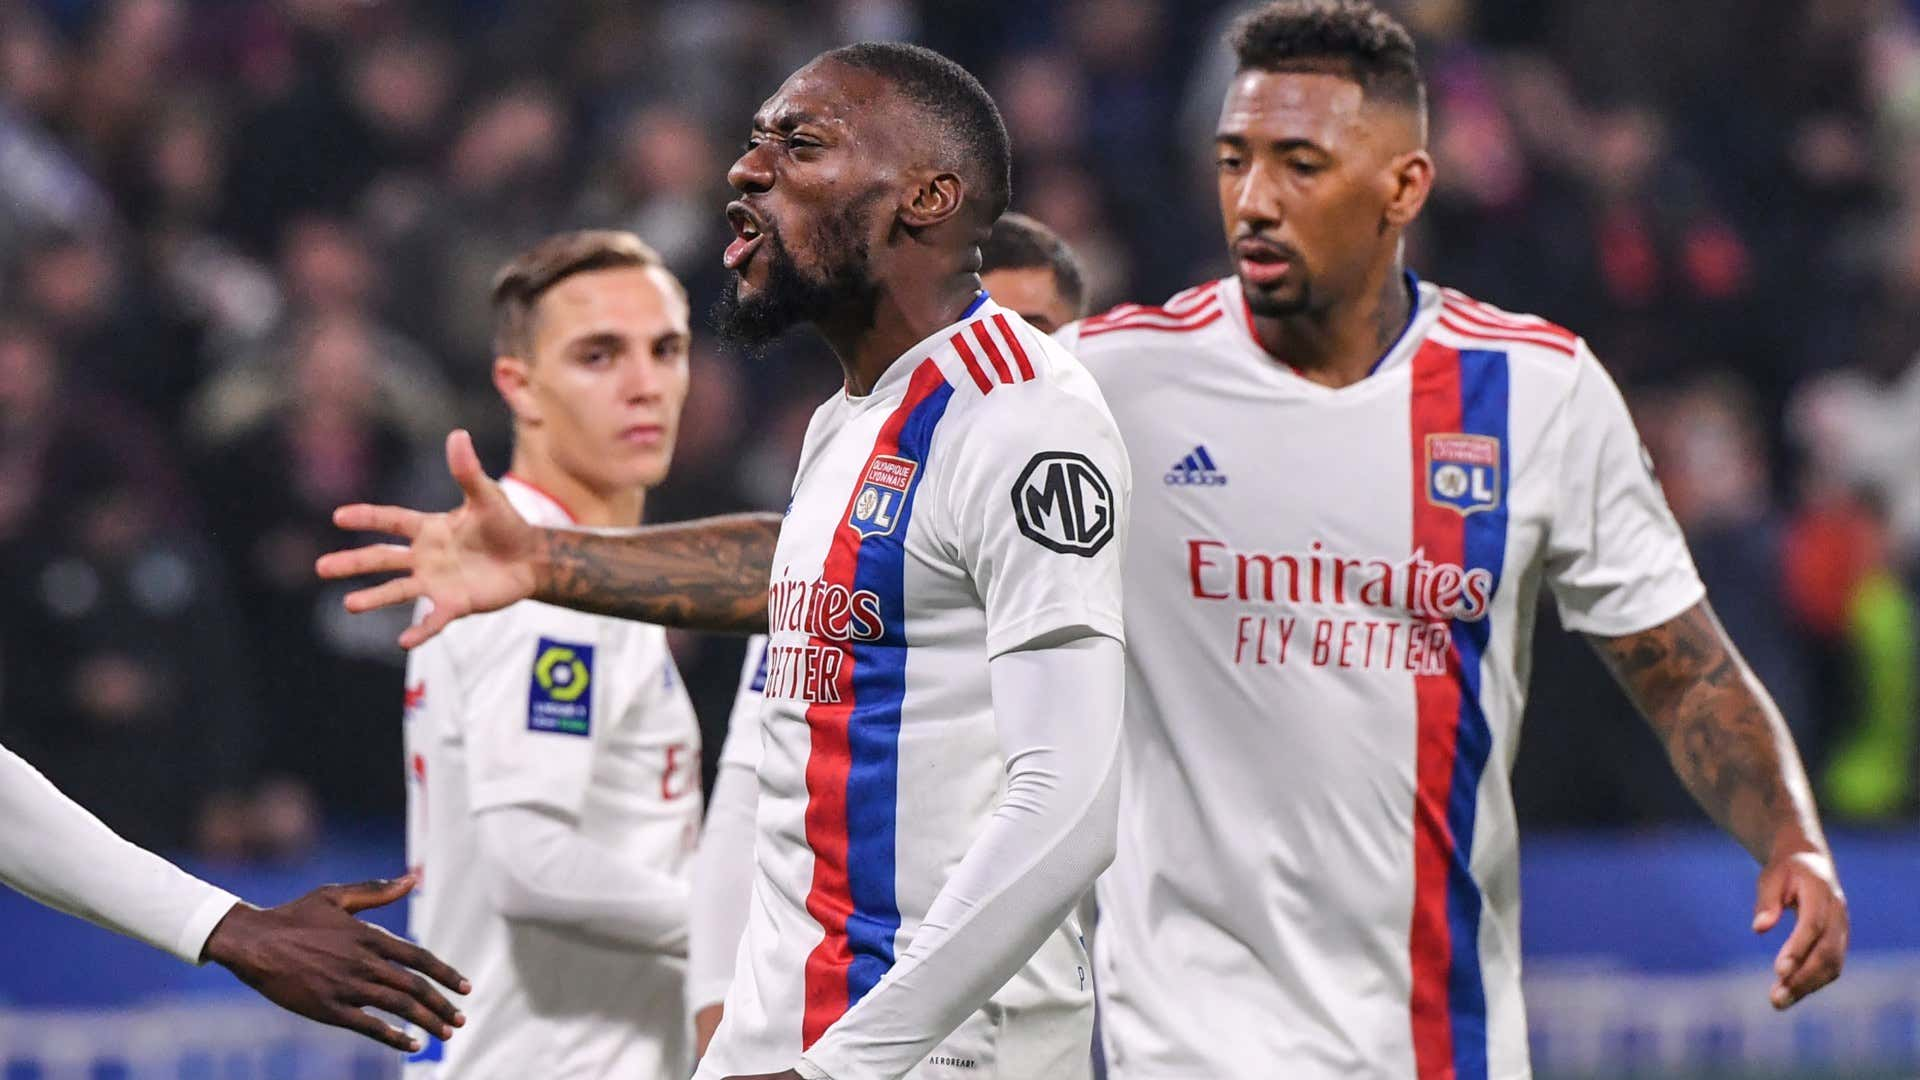 Toko Ekambi propels Olympique Lyon past AS Monaco